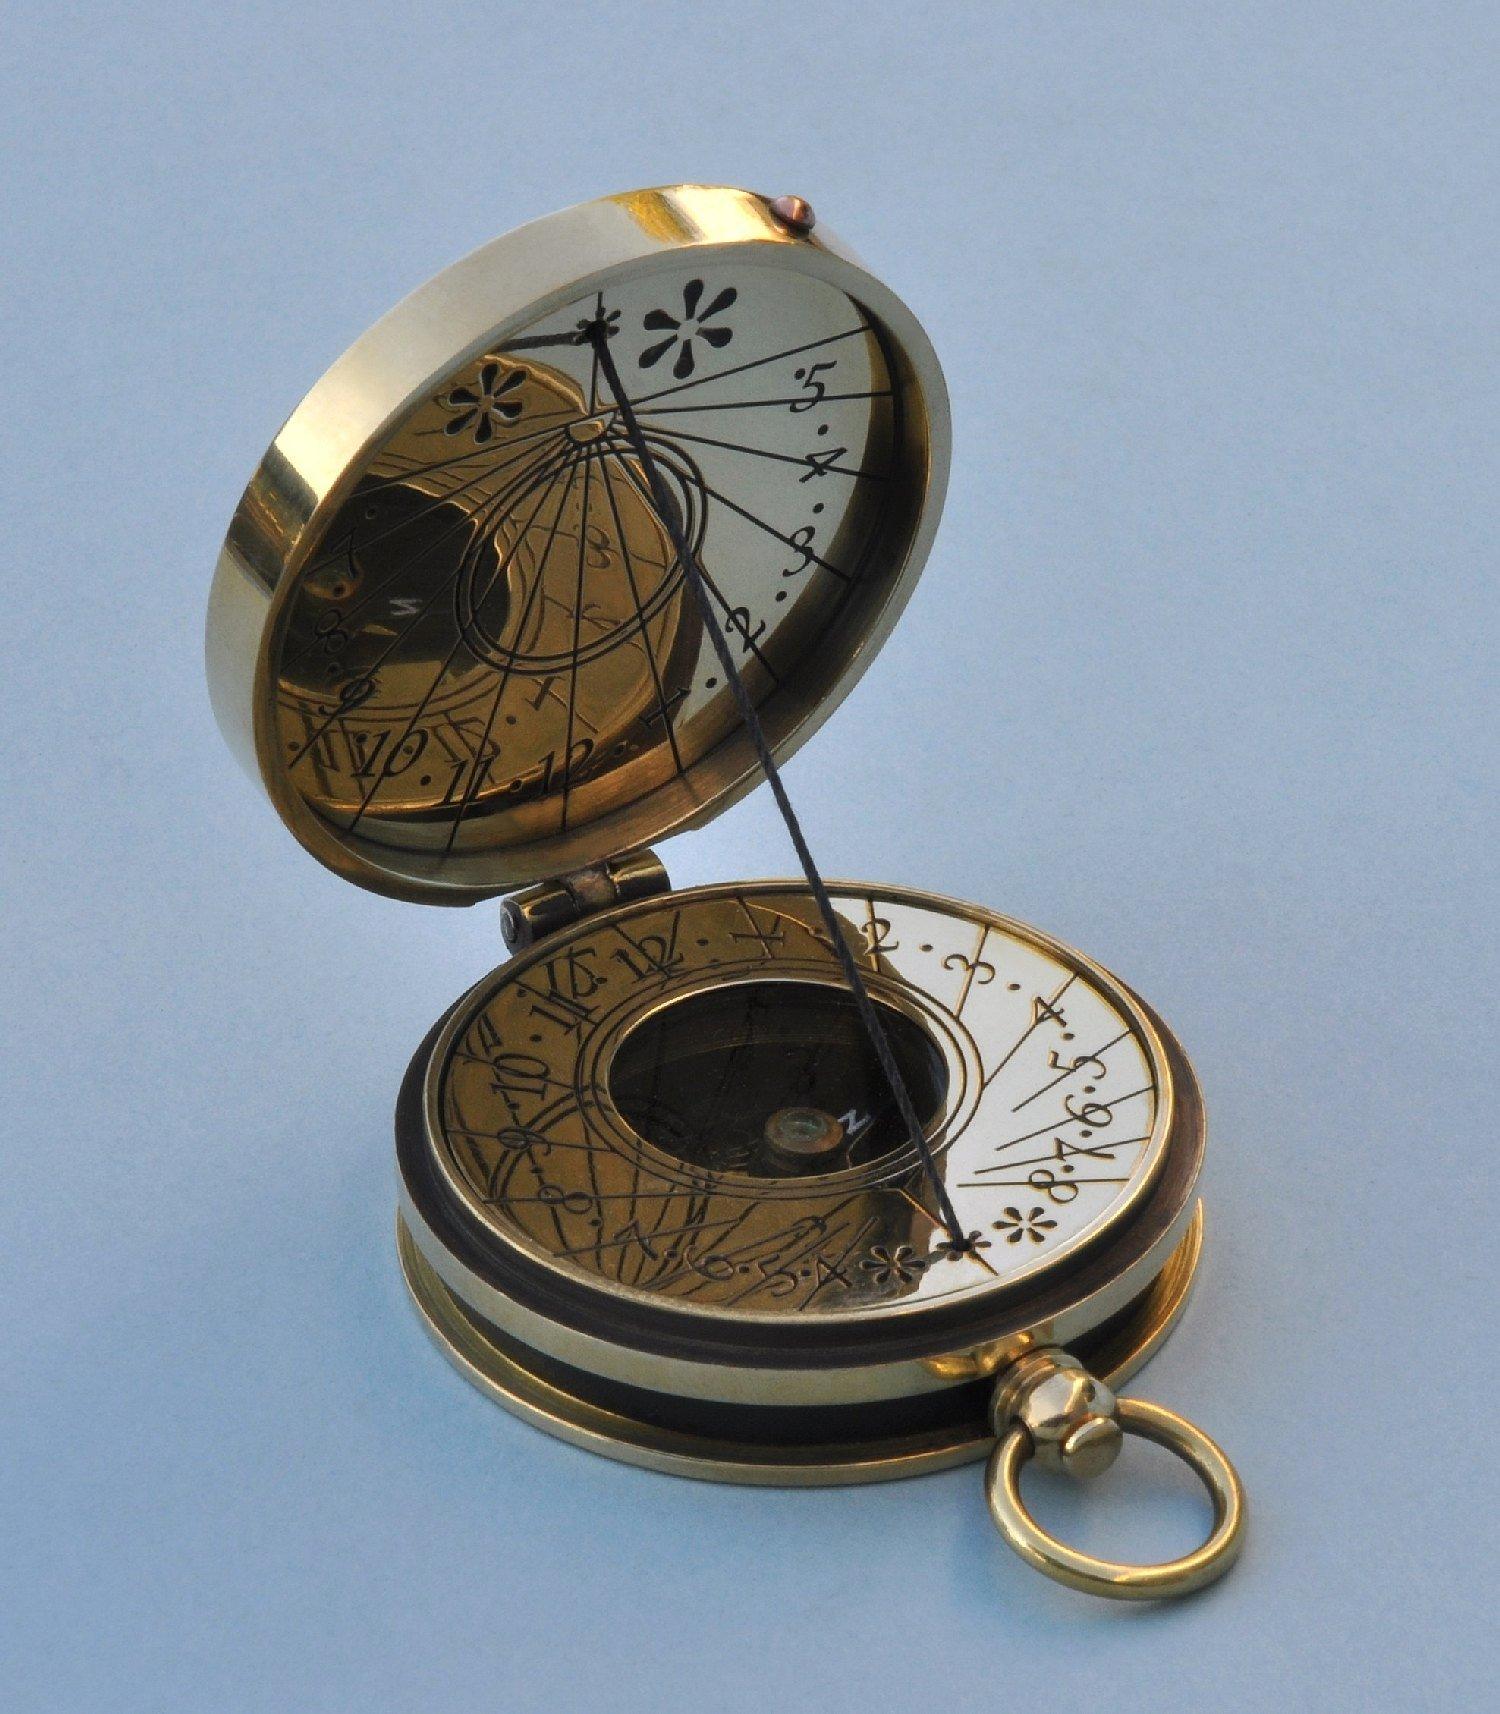 Polished Pocket Sundial Compass with Cord Gnomon